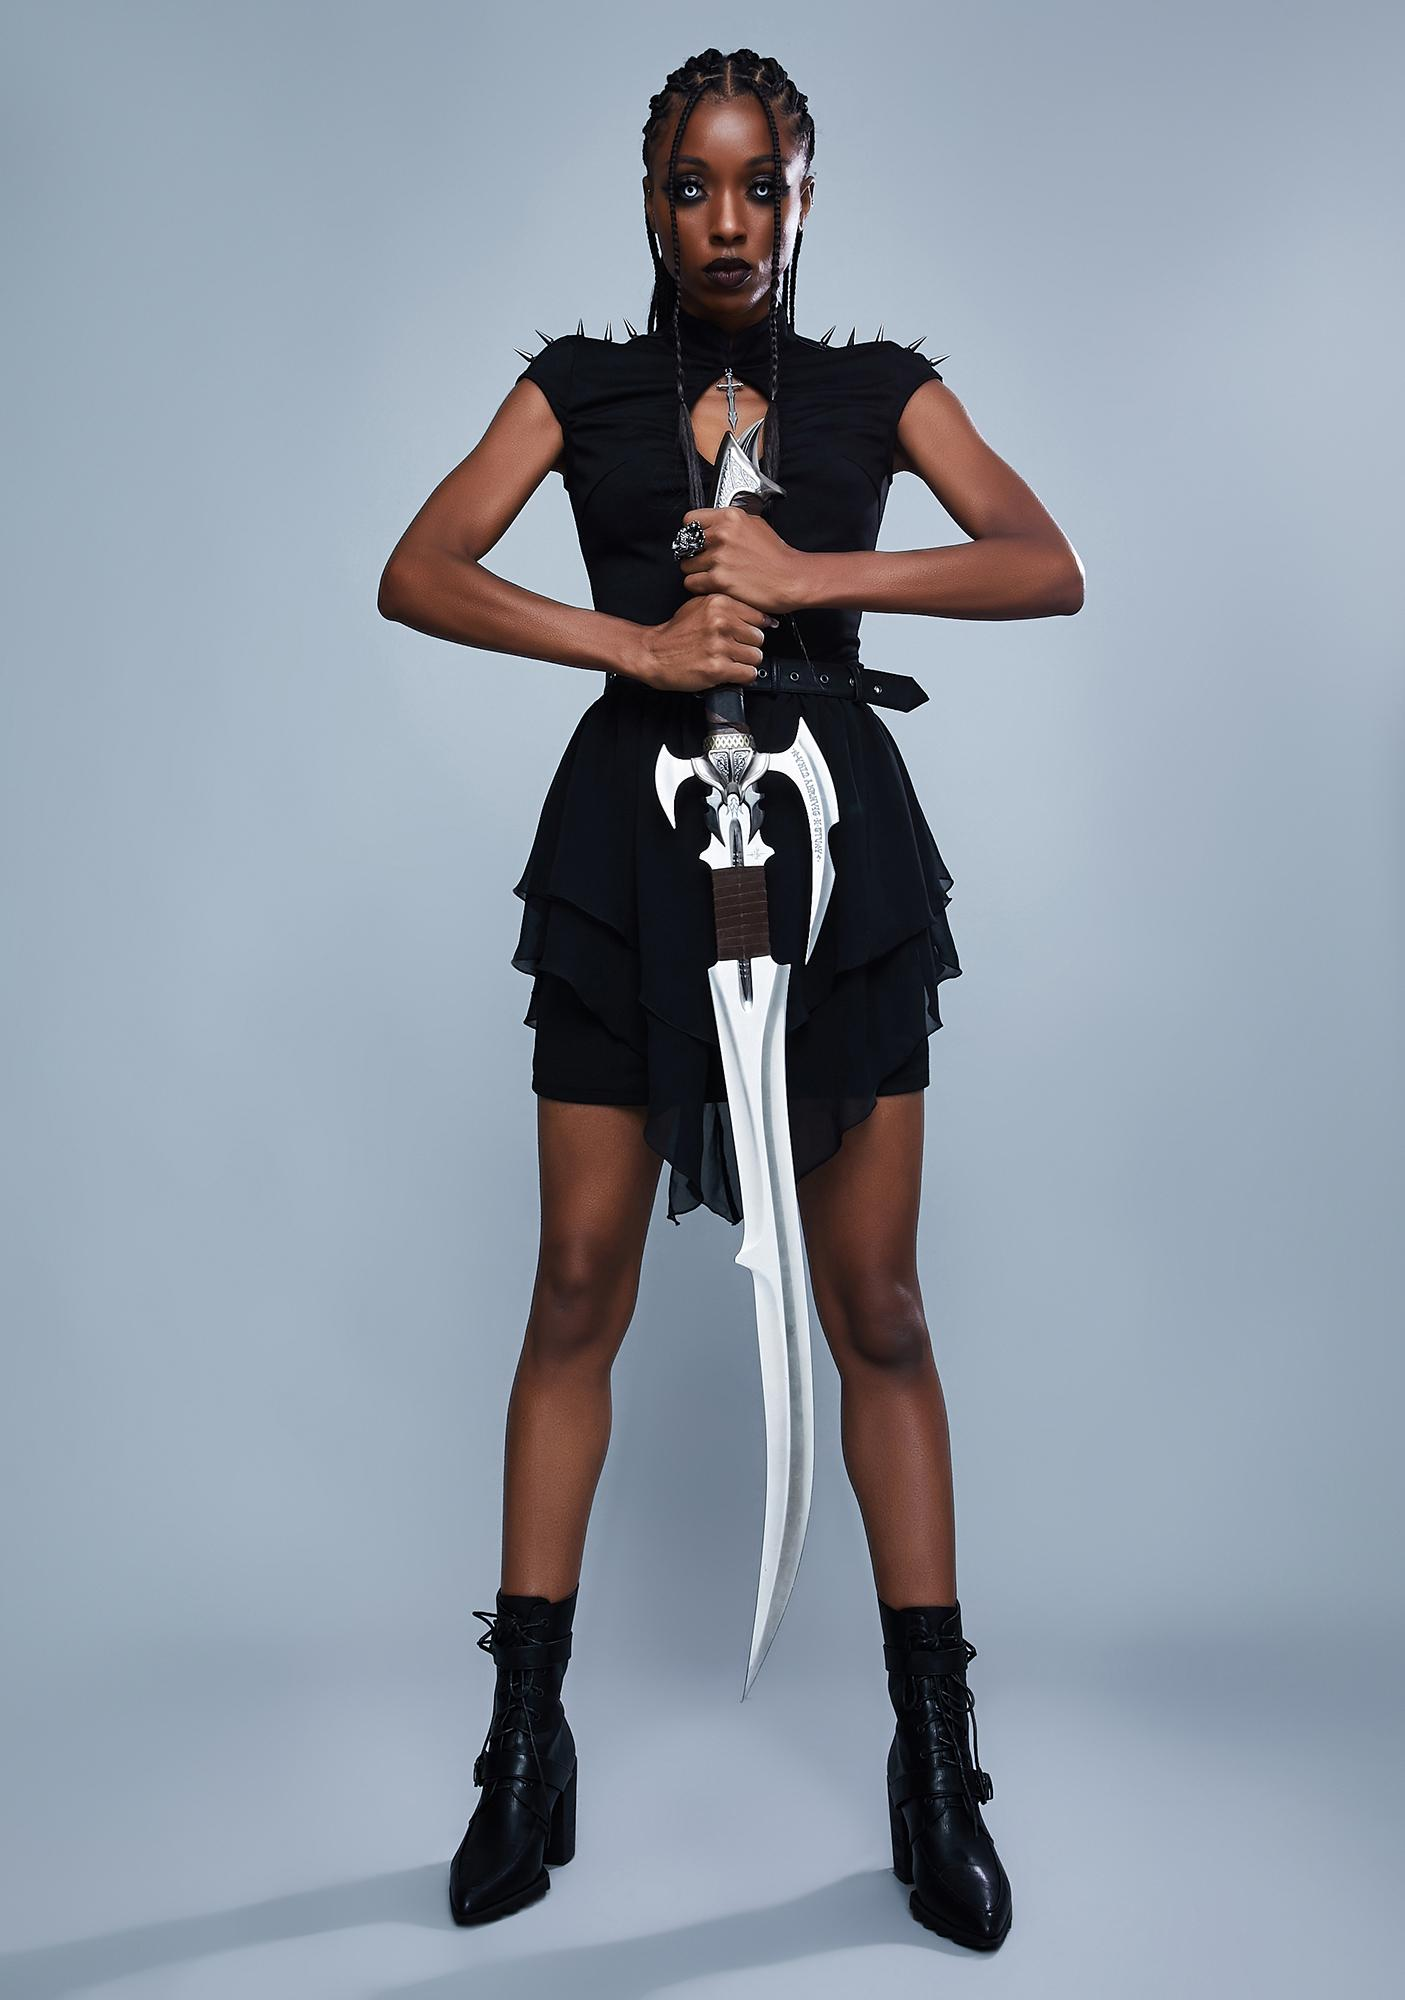 Widow Warrior Spirit Spiked Mini Dress